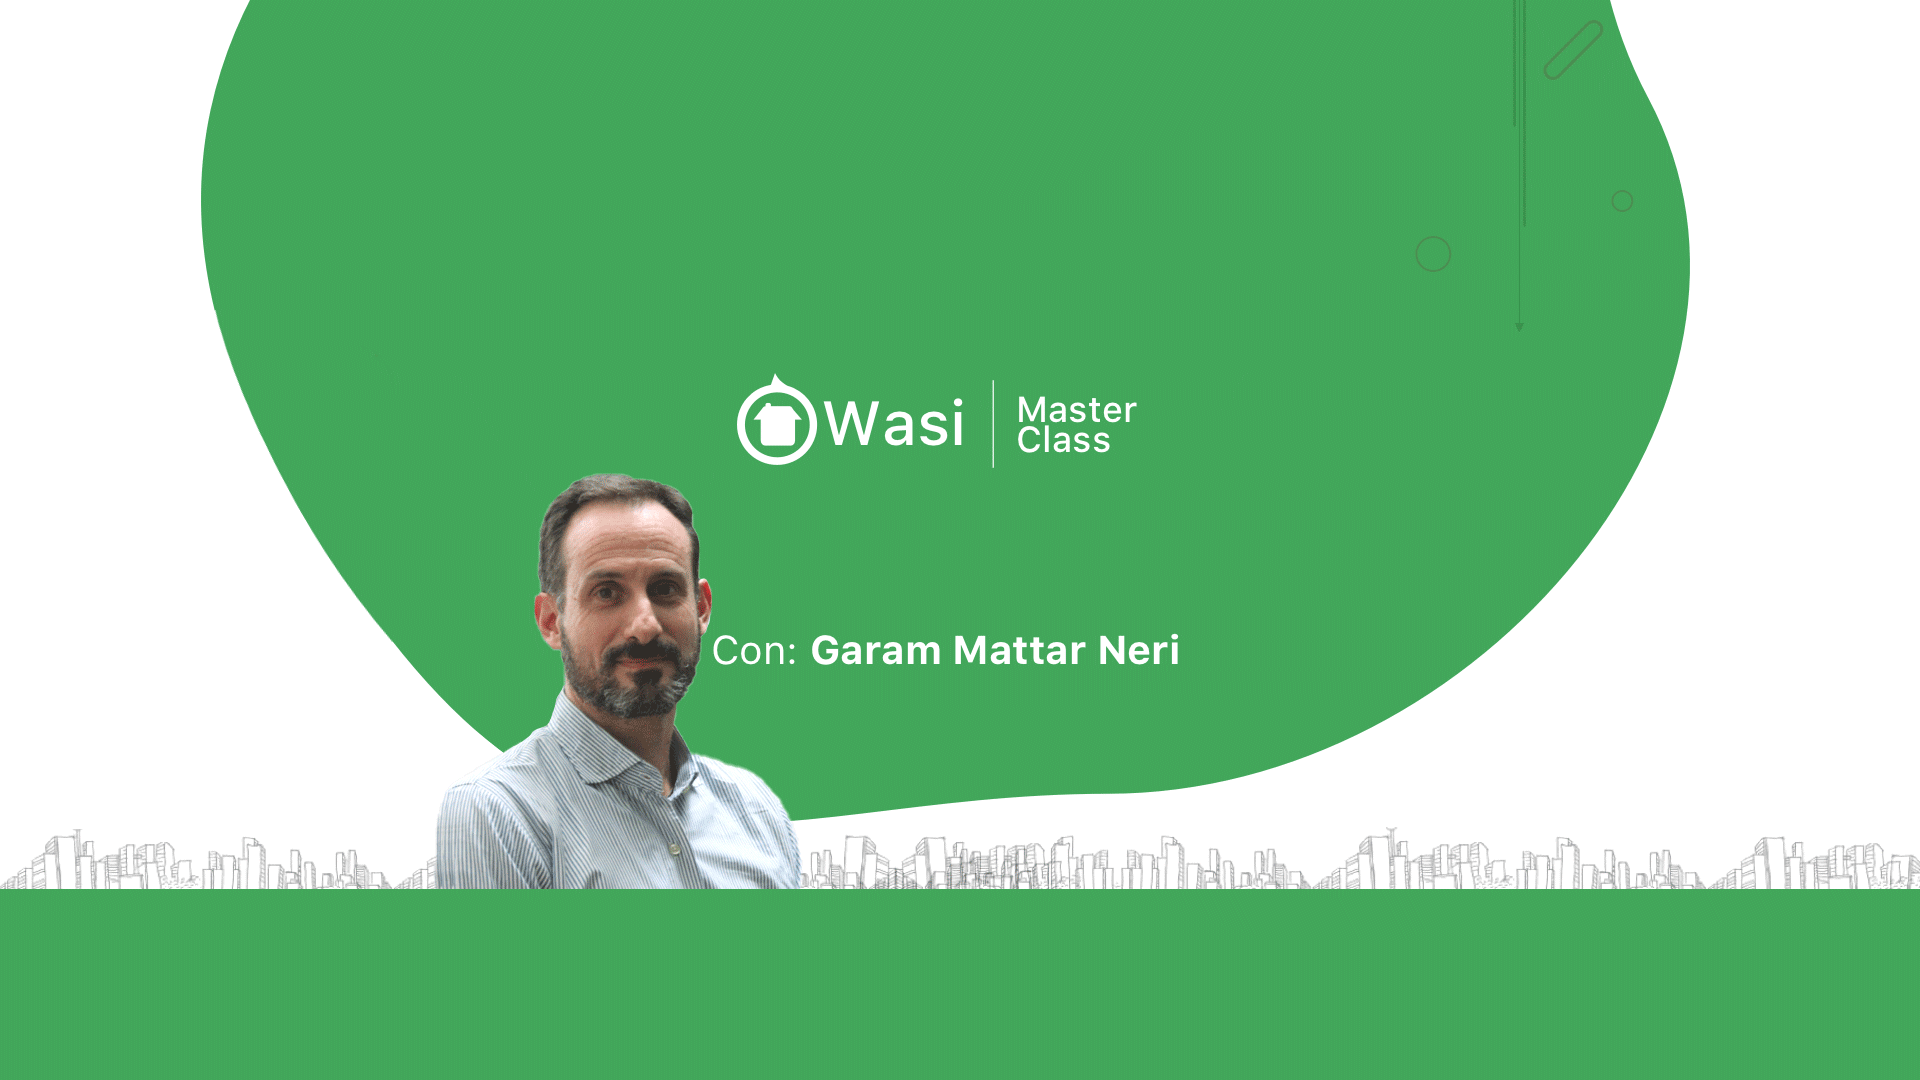 Wasi Master Class Experiencia al cliente